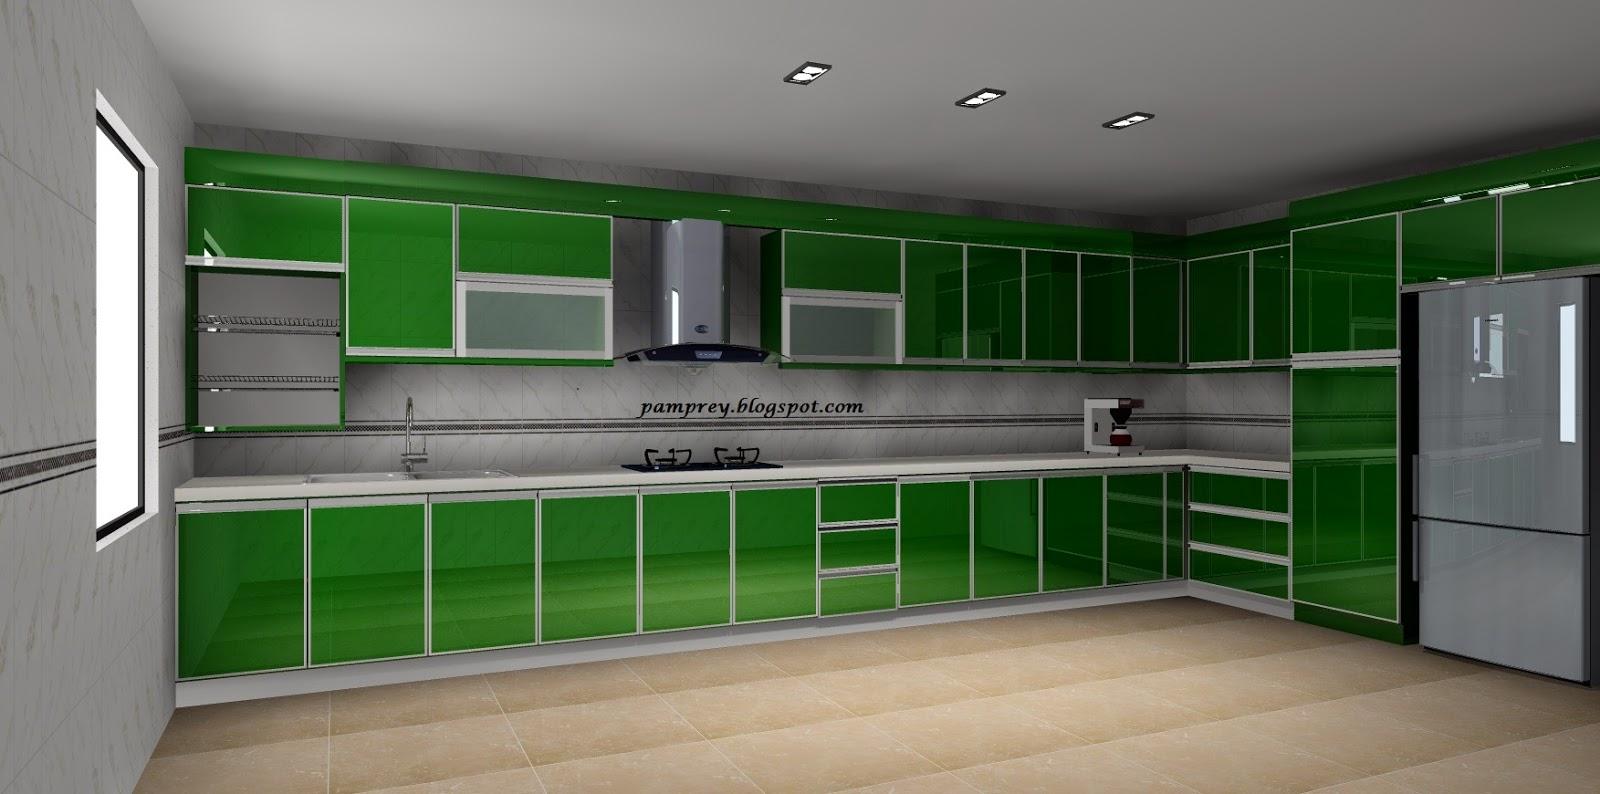 Inium Kinraramas Kinrara Kabinet Dapur Concrete Tile